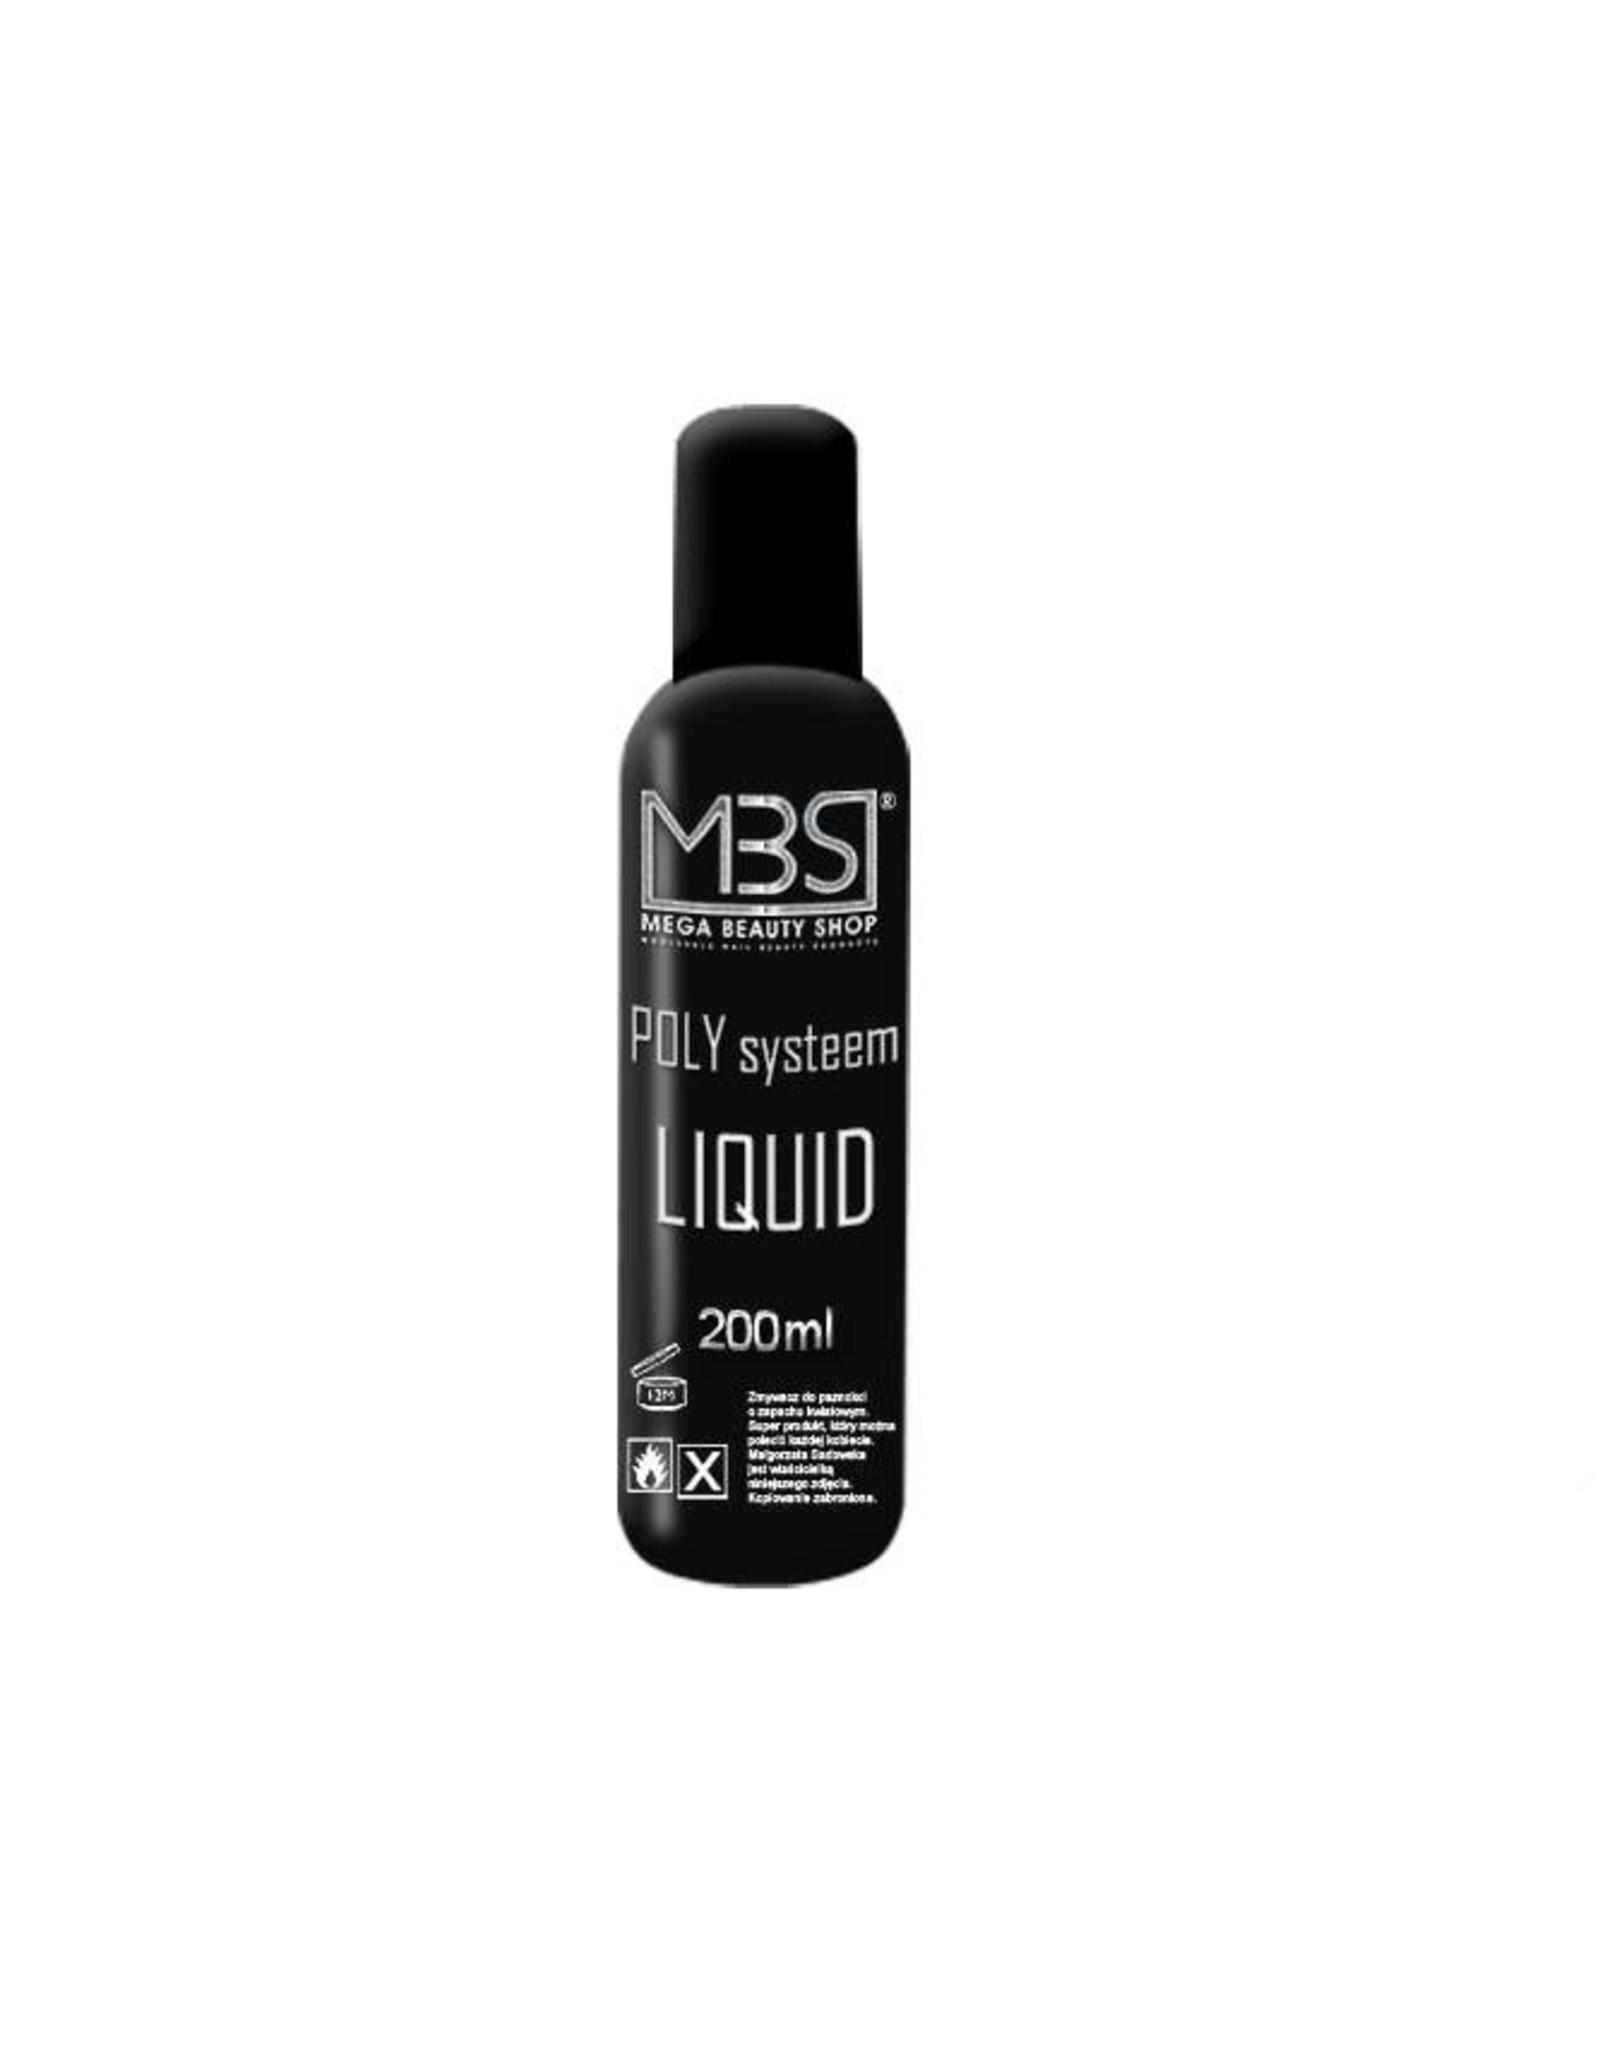 Mega Beauty Shop® POLY Systeem Liquid (200 ml)